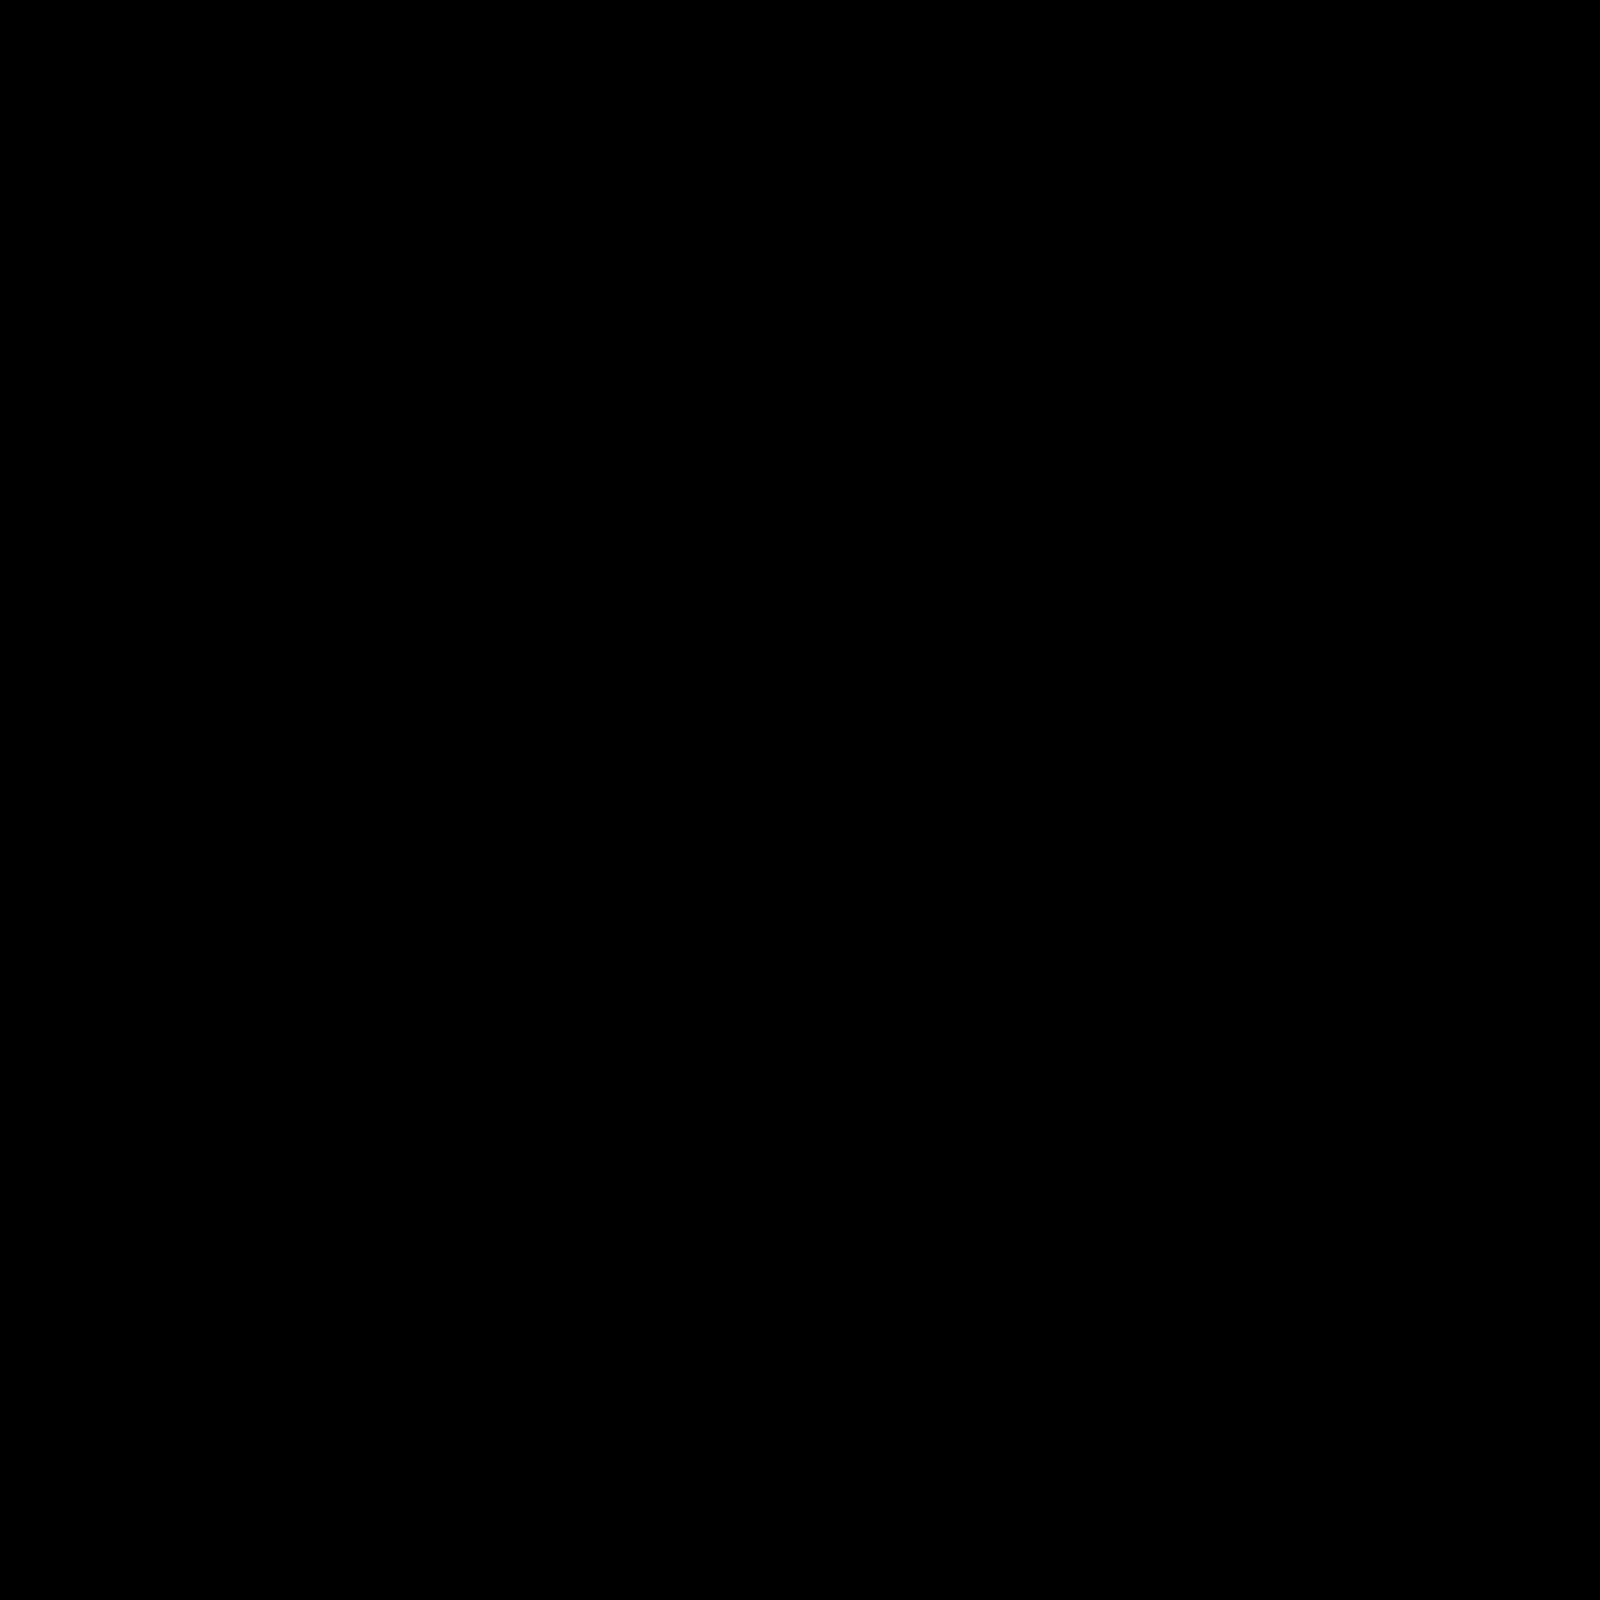 Folder porno icon